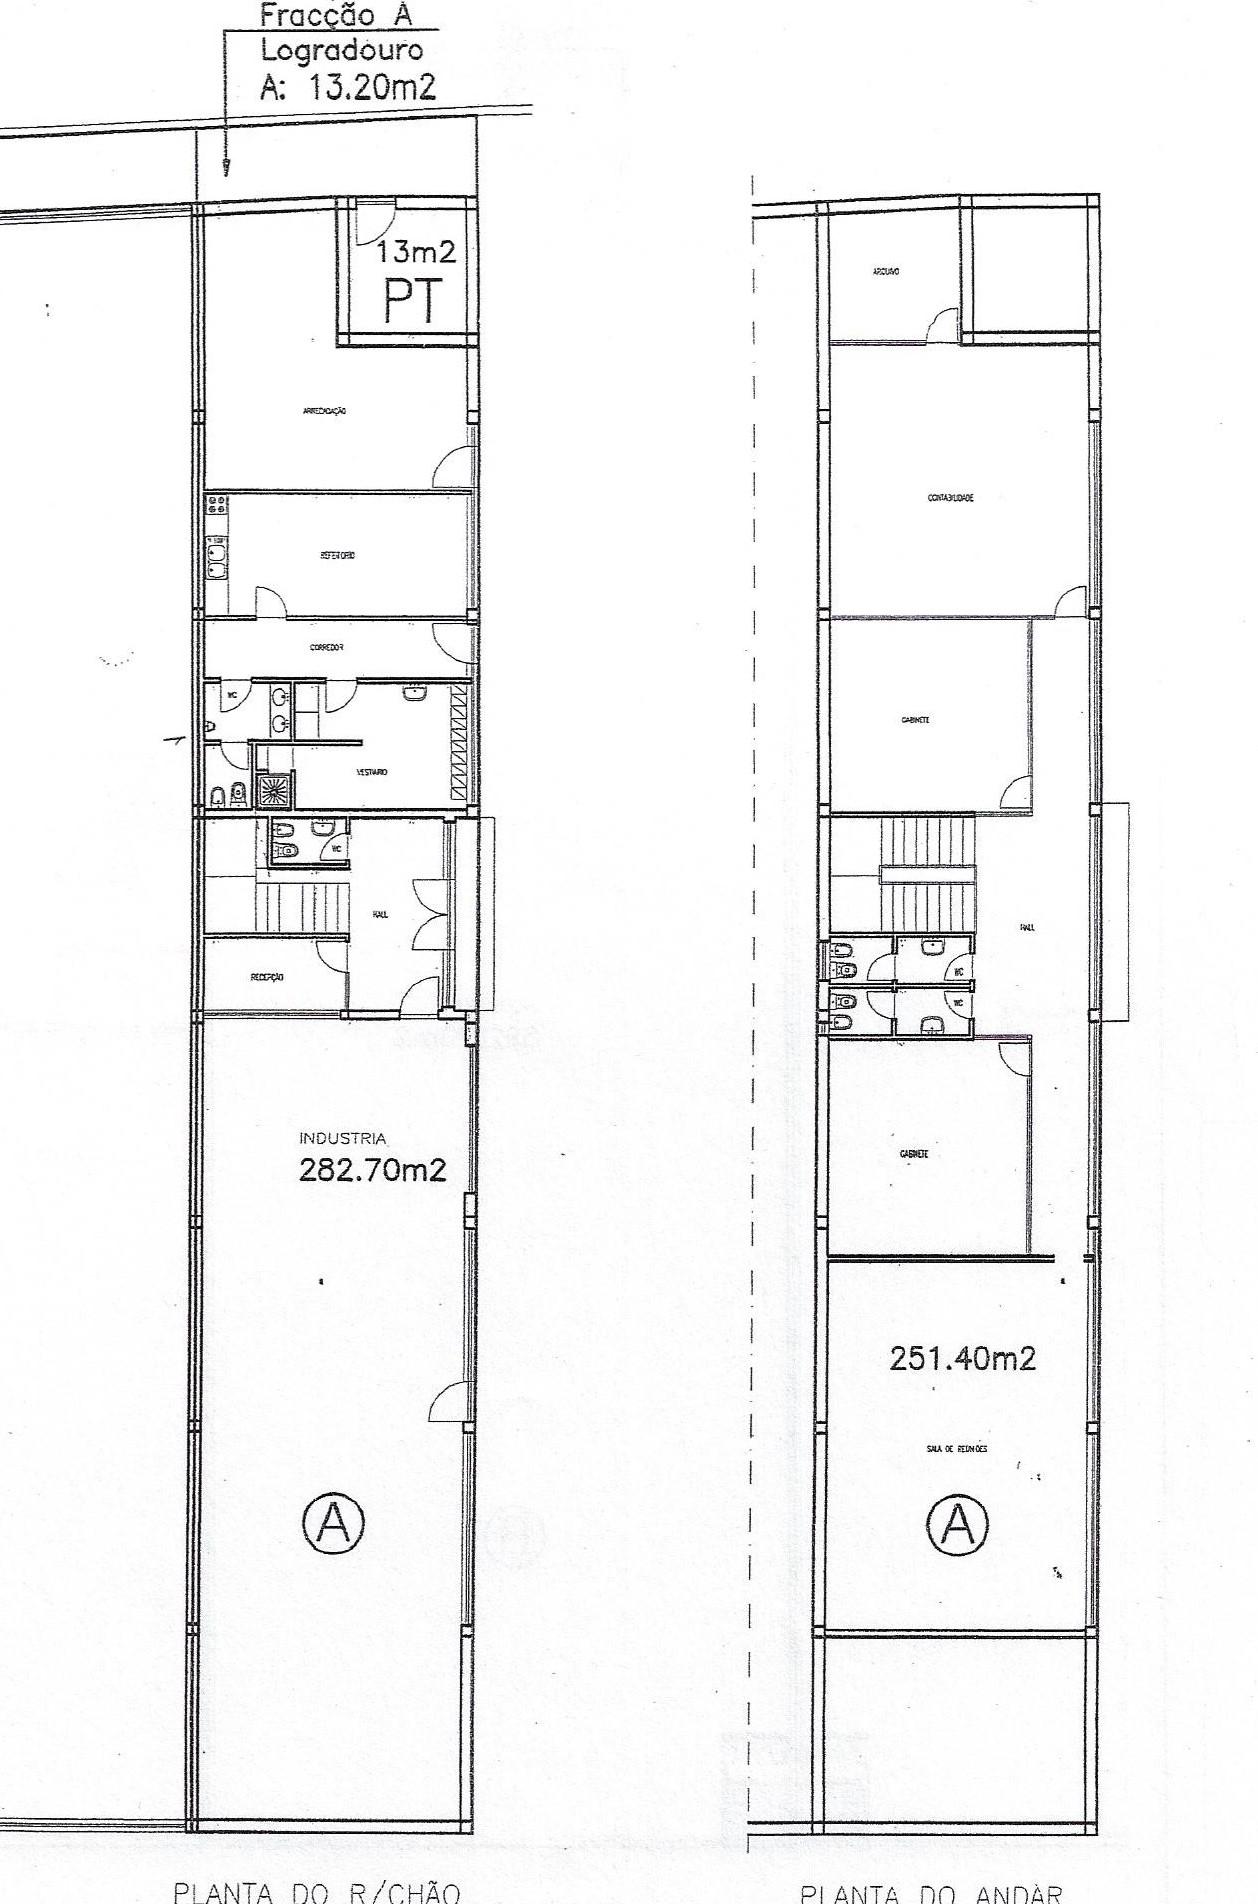 General drawings